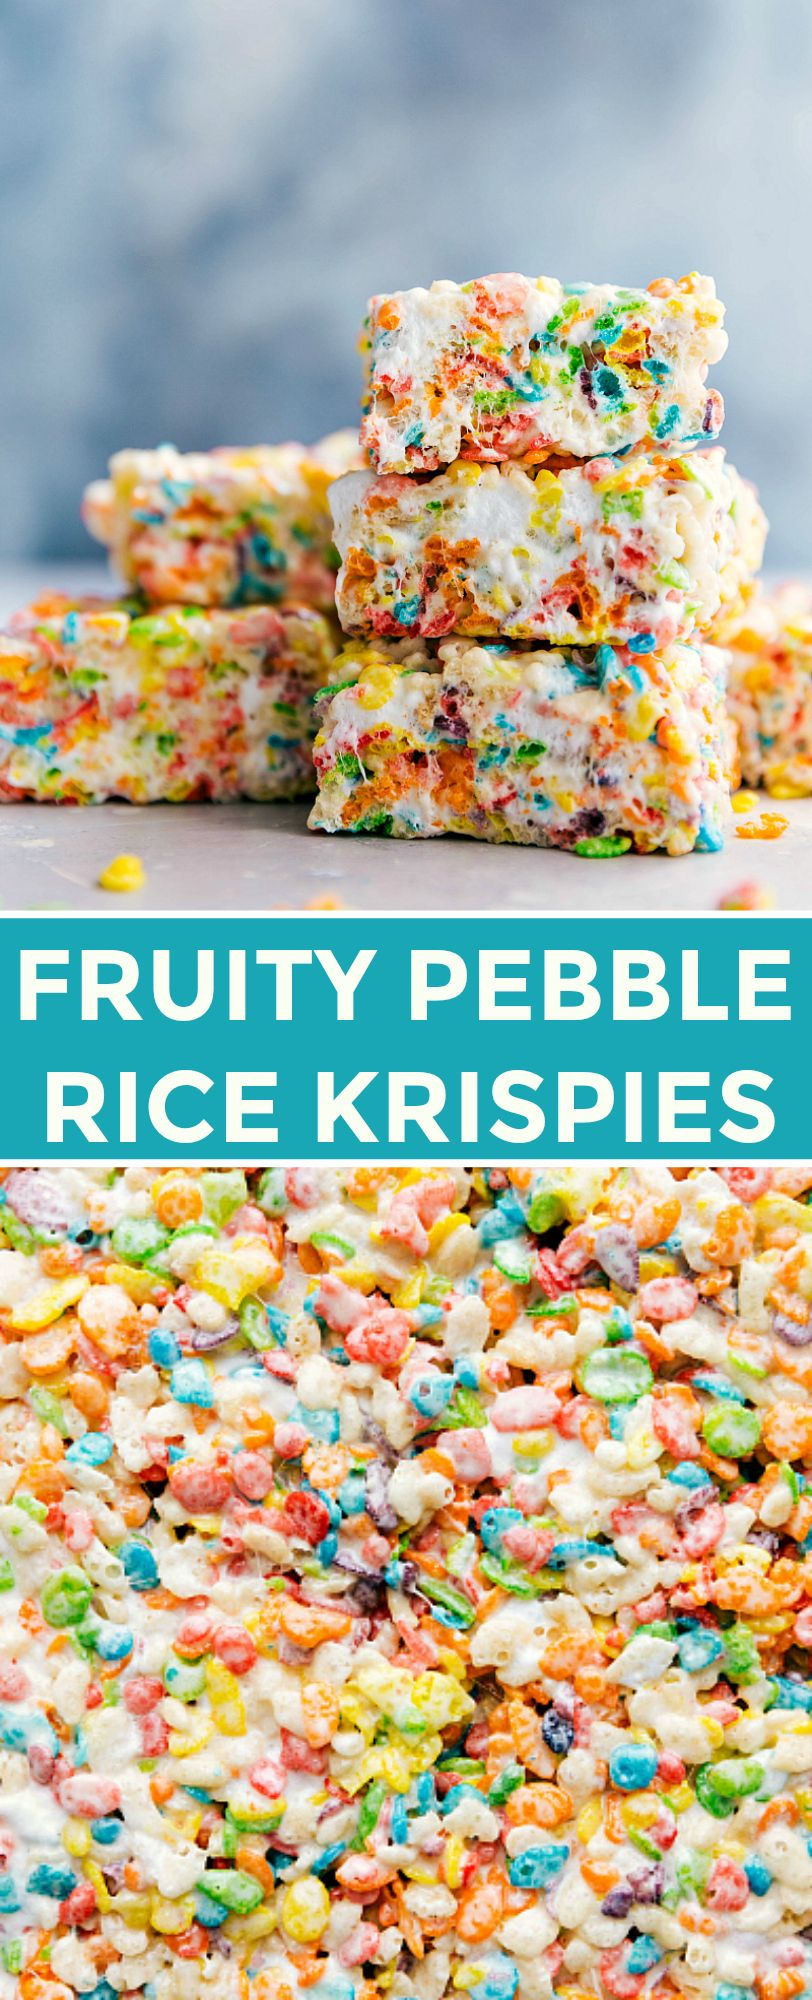 how to make a fruity pebble rice krispie treats